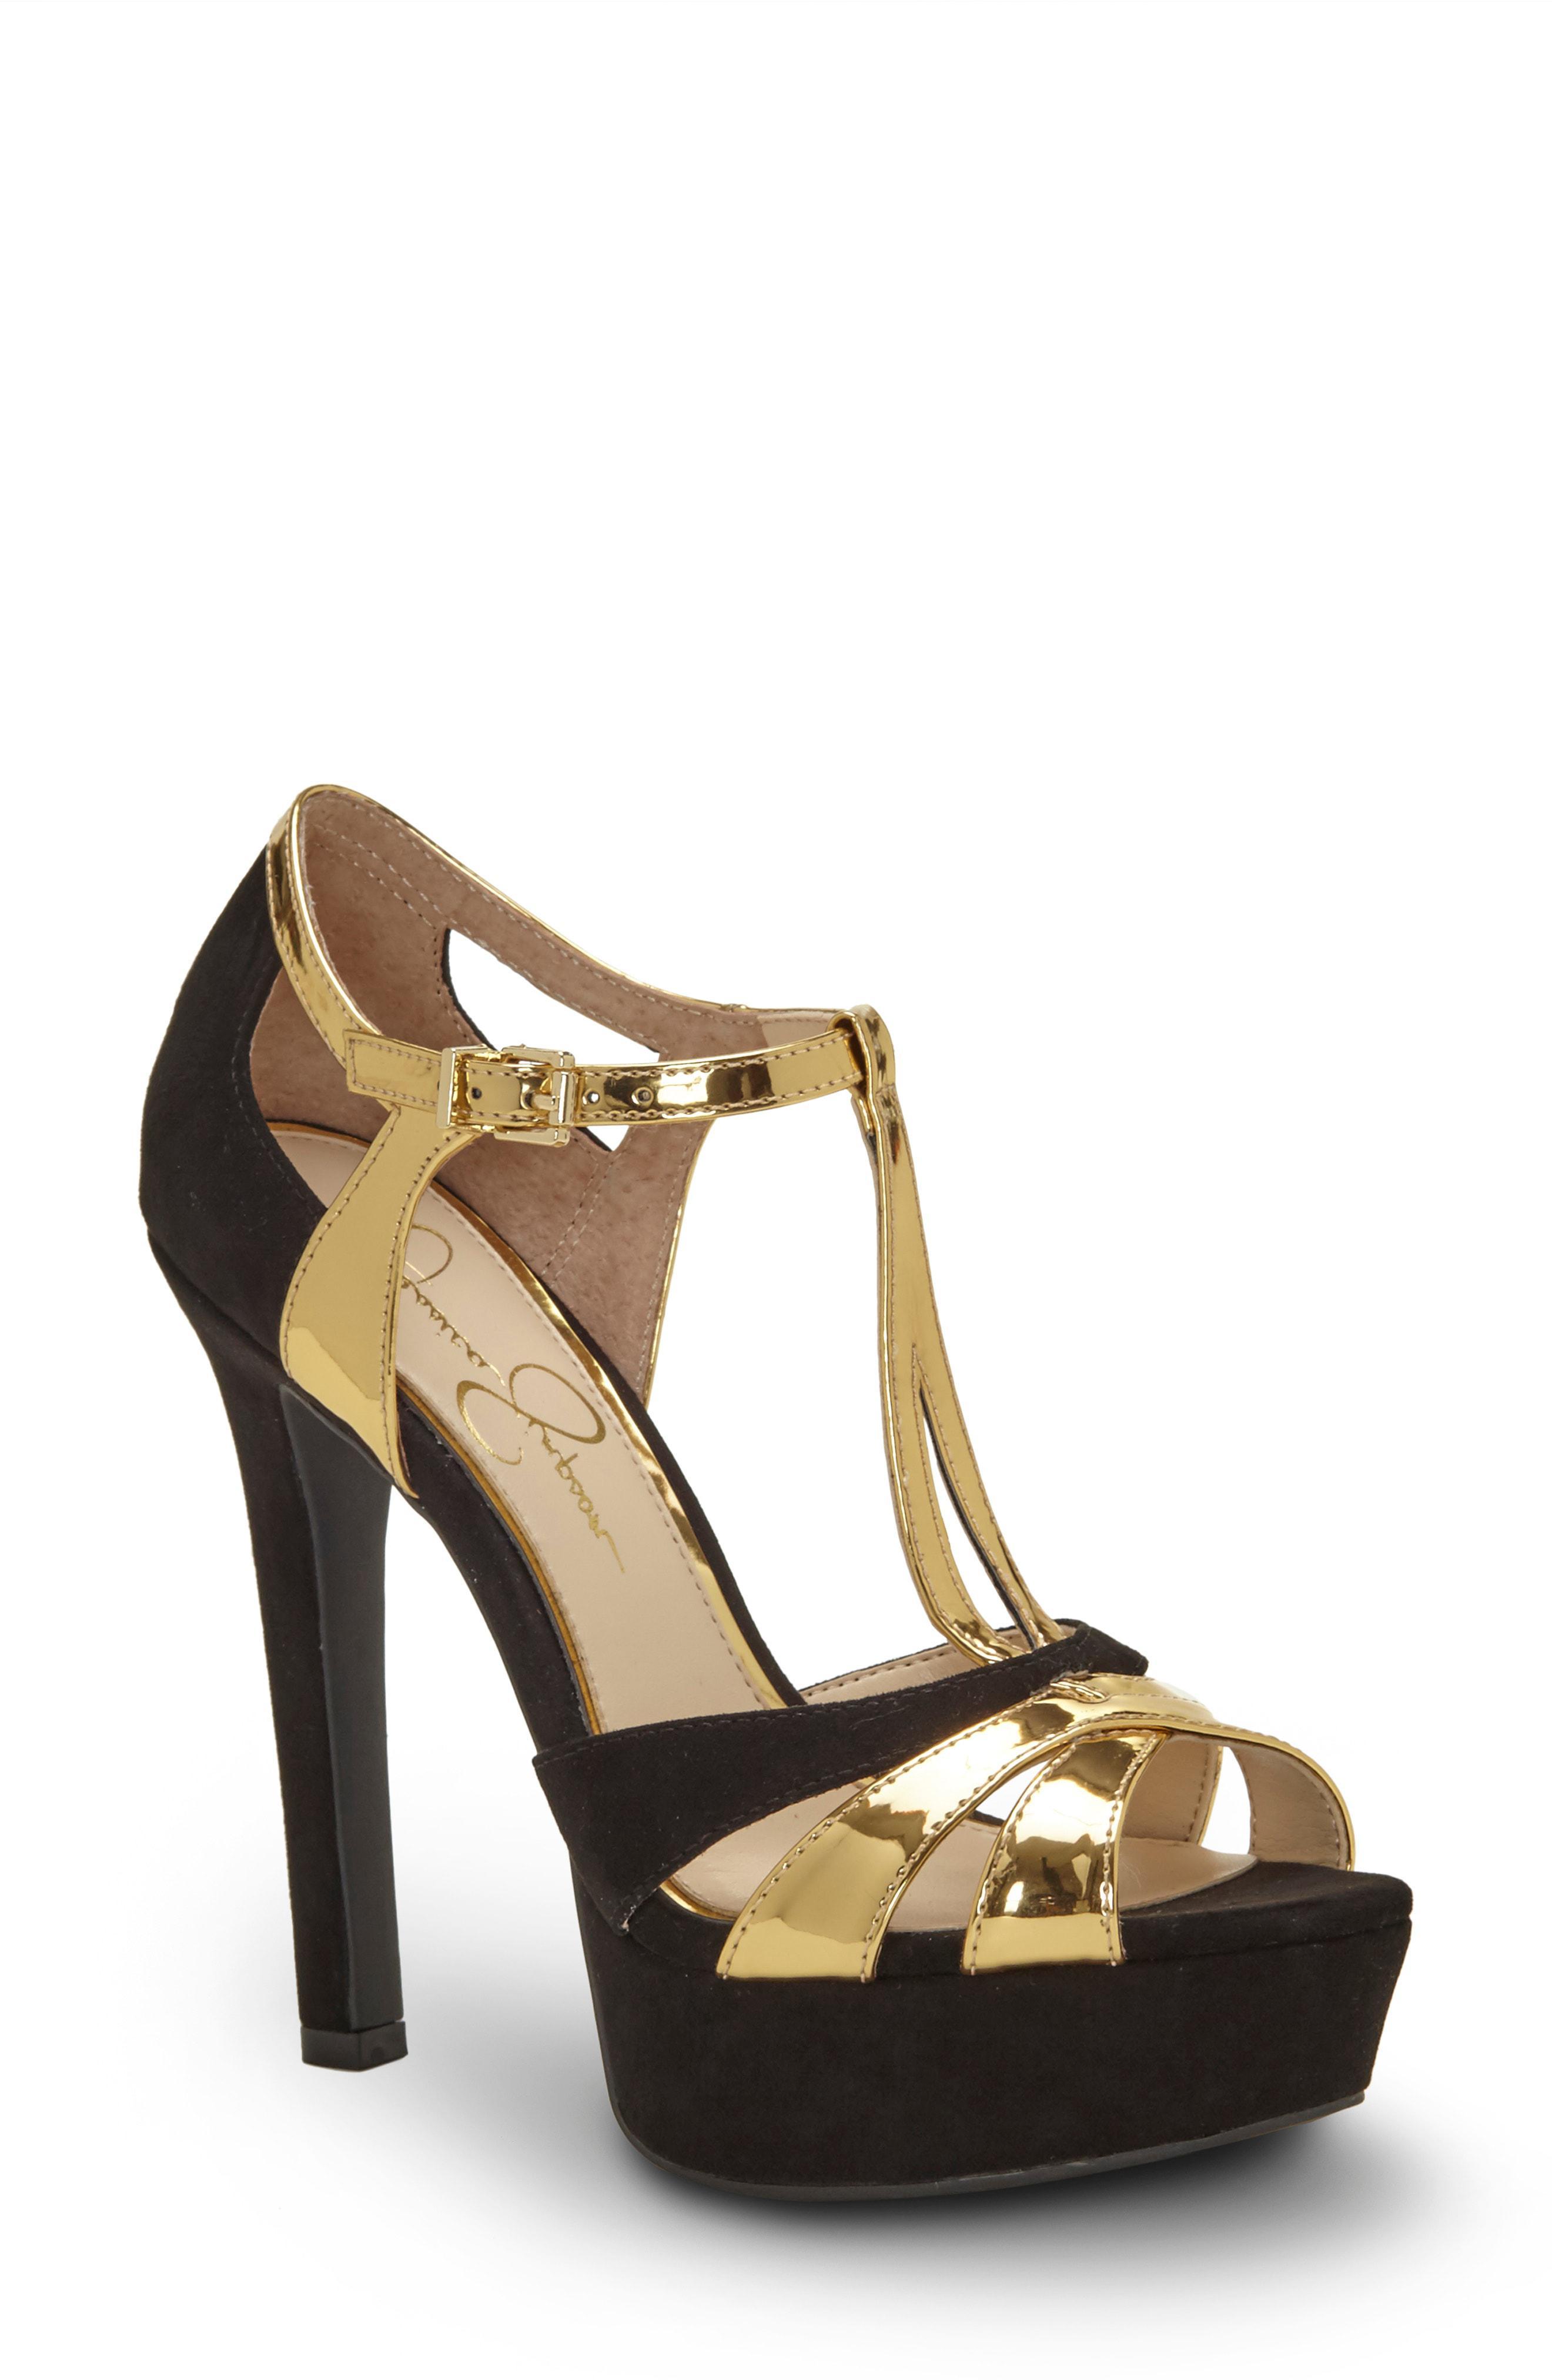 d4c11c8e122 Lyst - Jessica Simpson Bryanne Sandal in Metallic